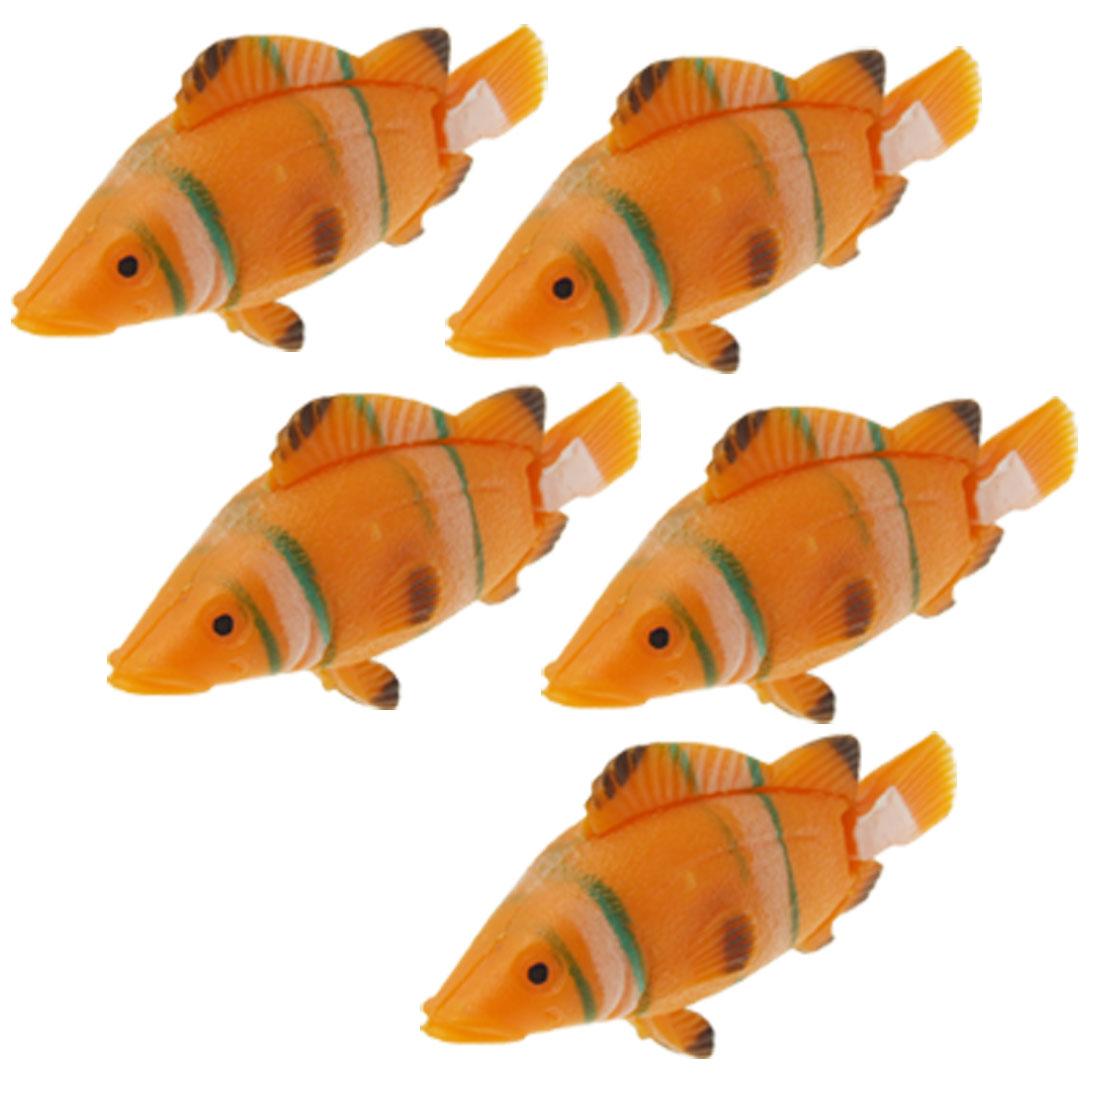 Sea Lifelikes Floating Plastic Fish Aquarium Decor 5pcs